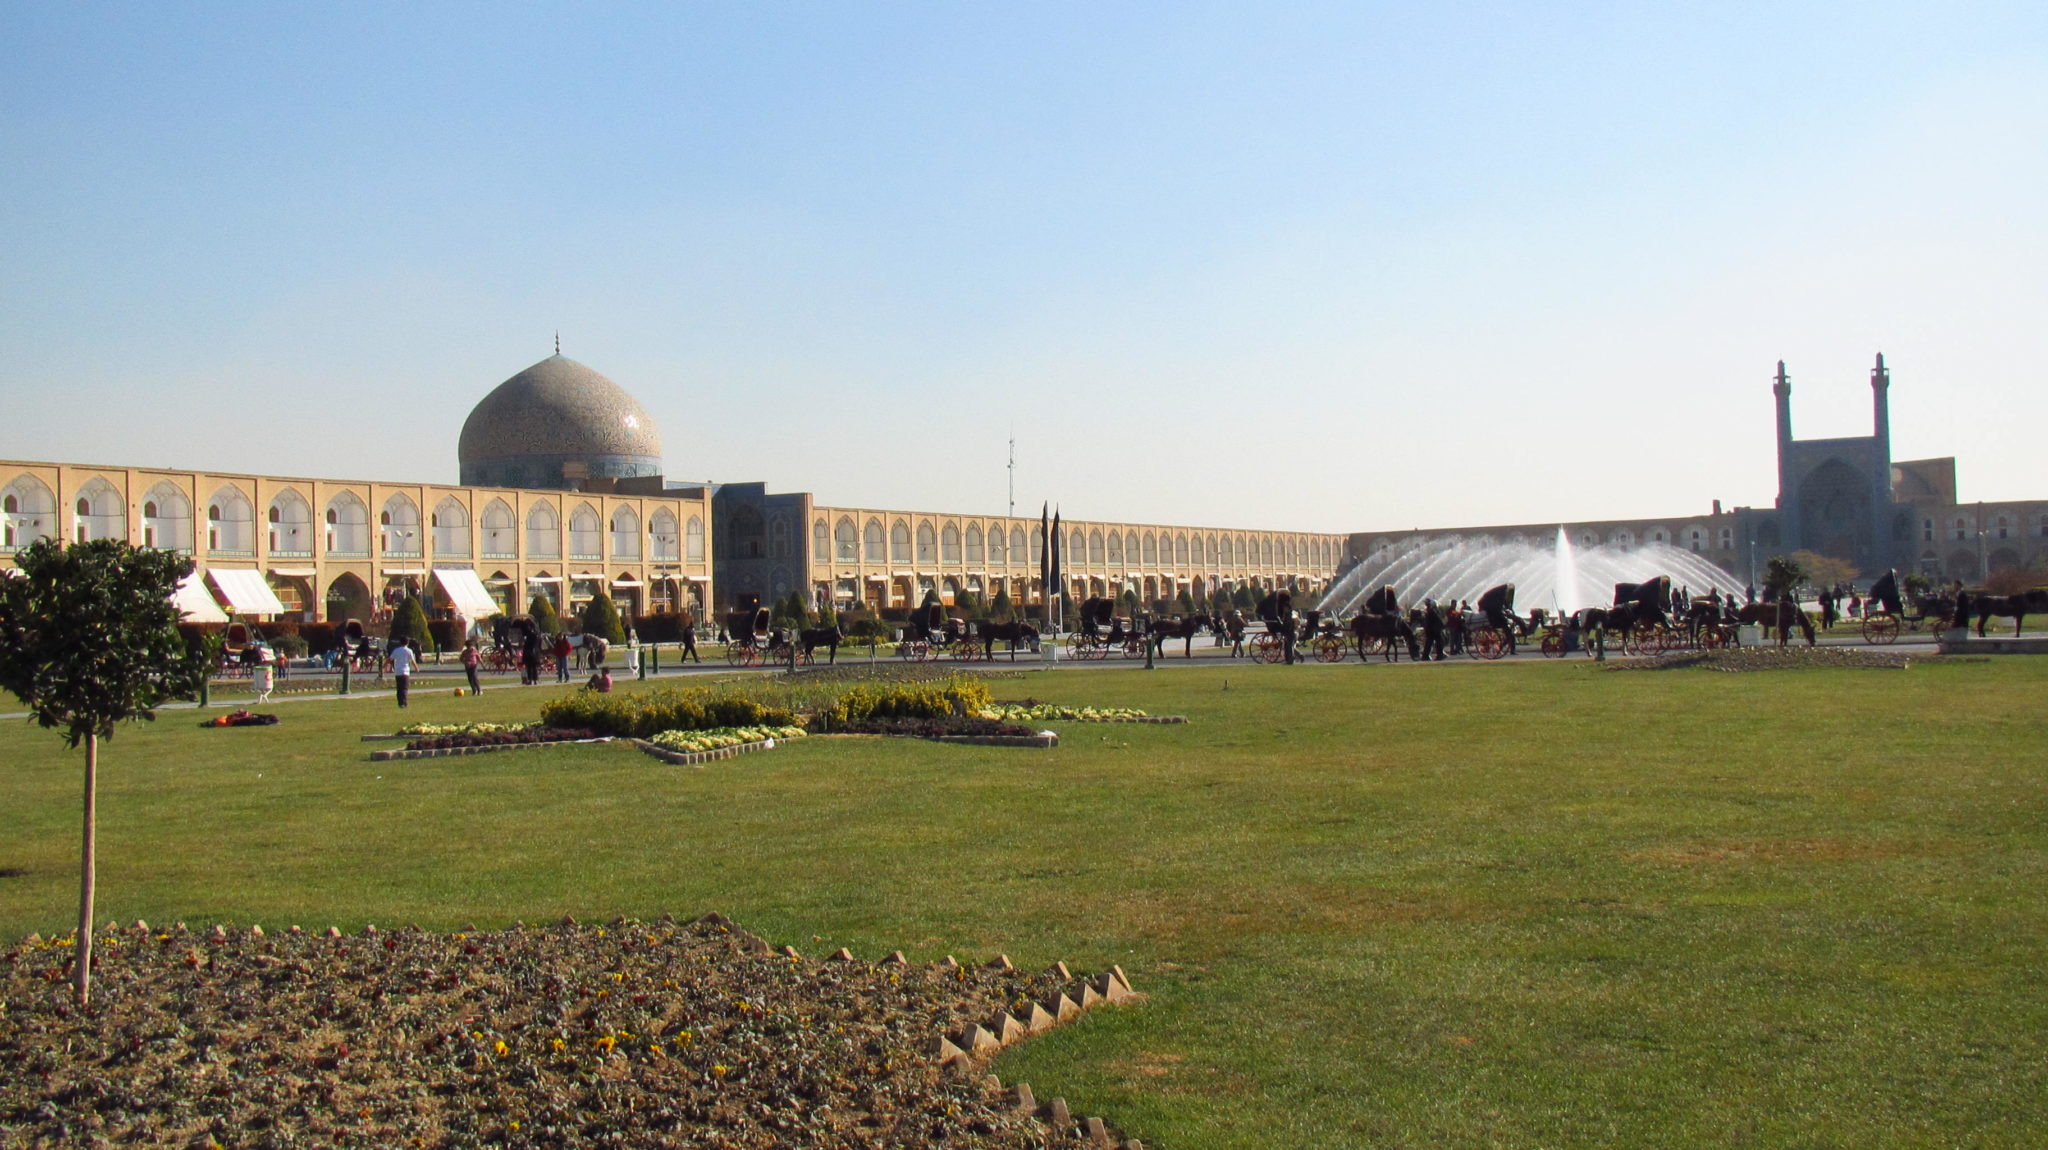 Returning to Isfahan